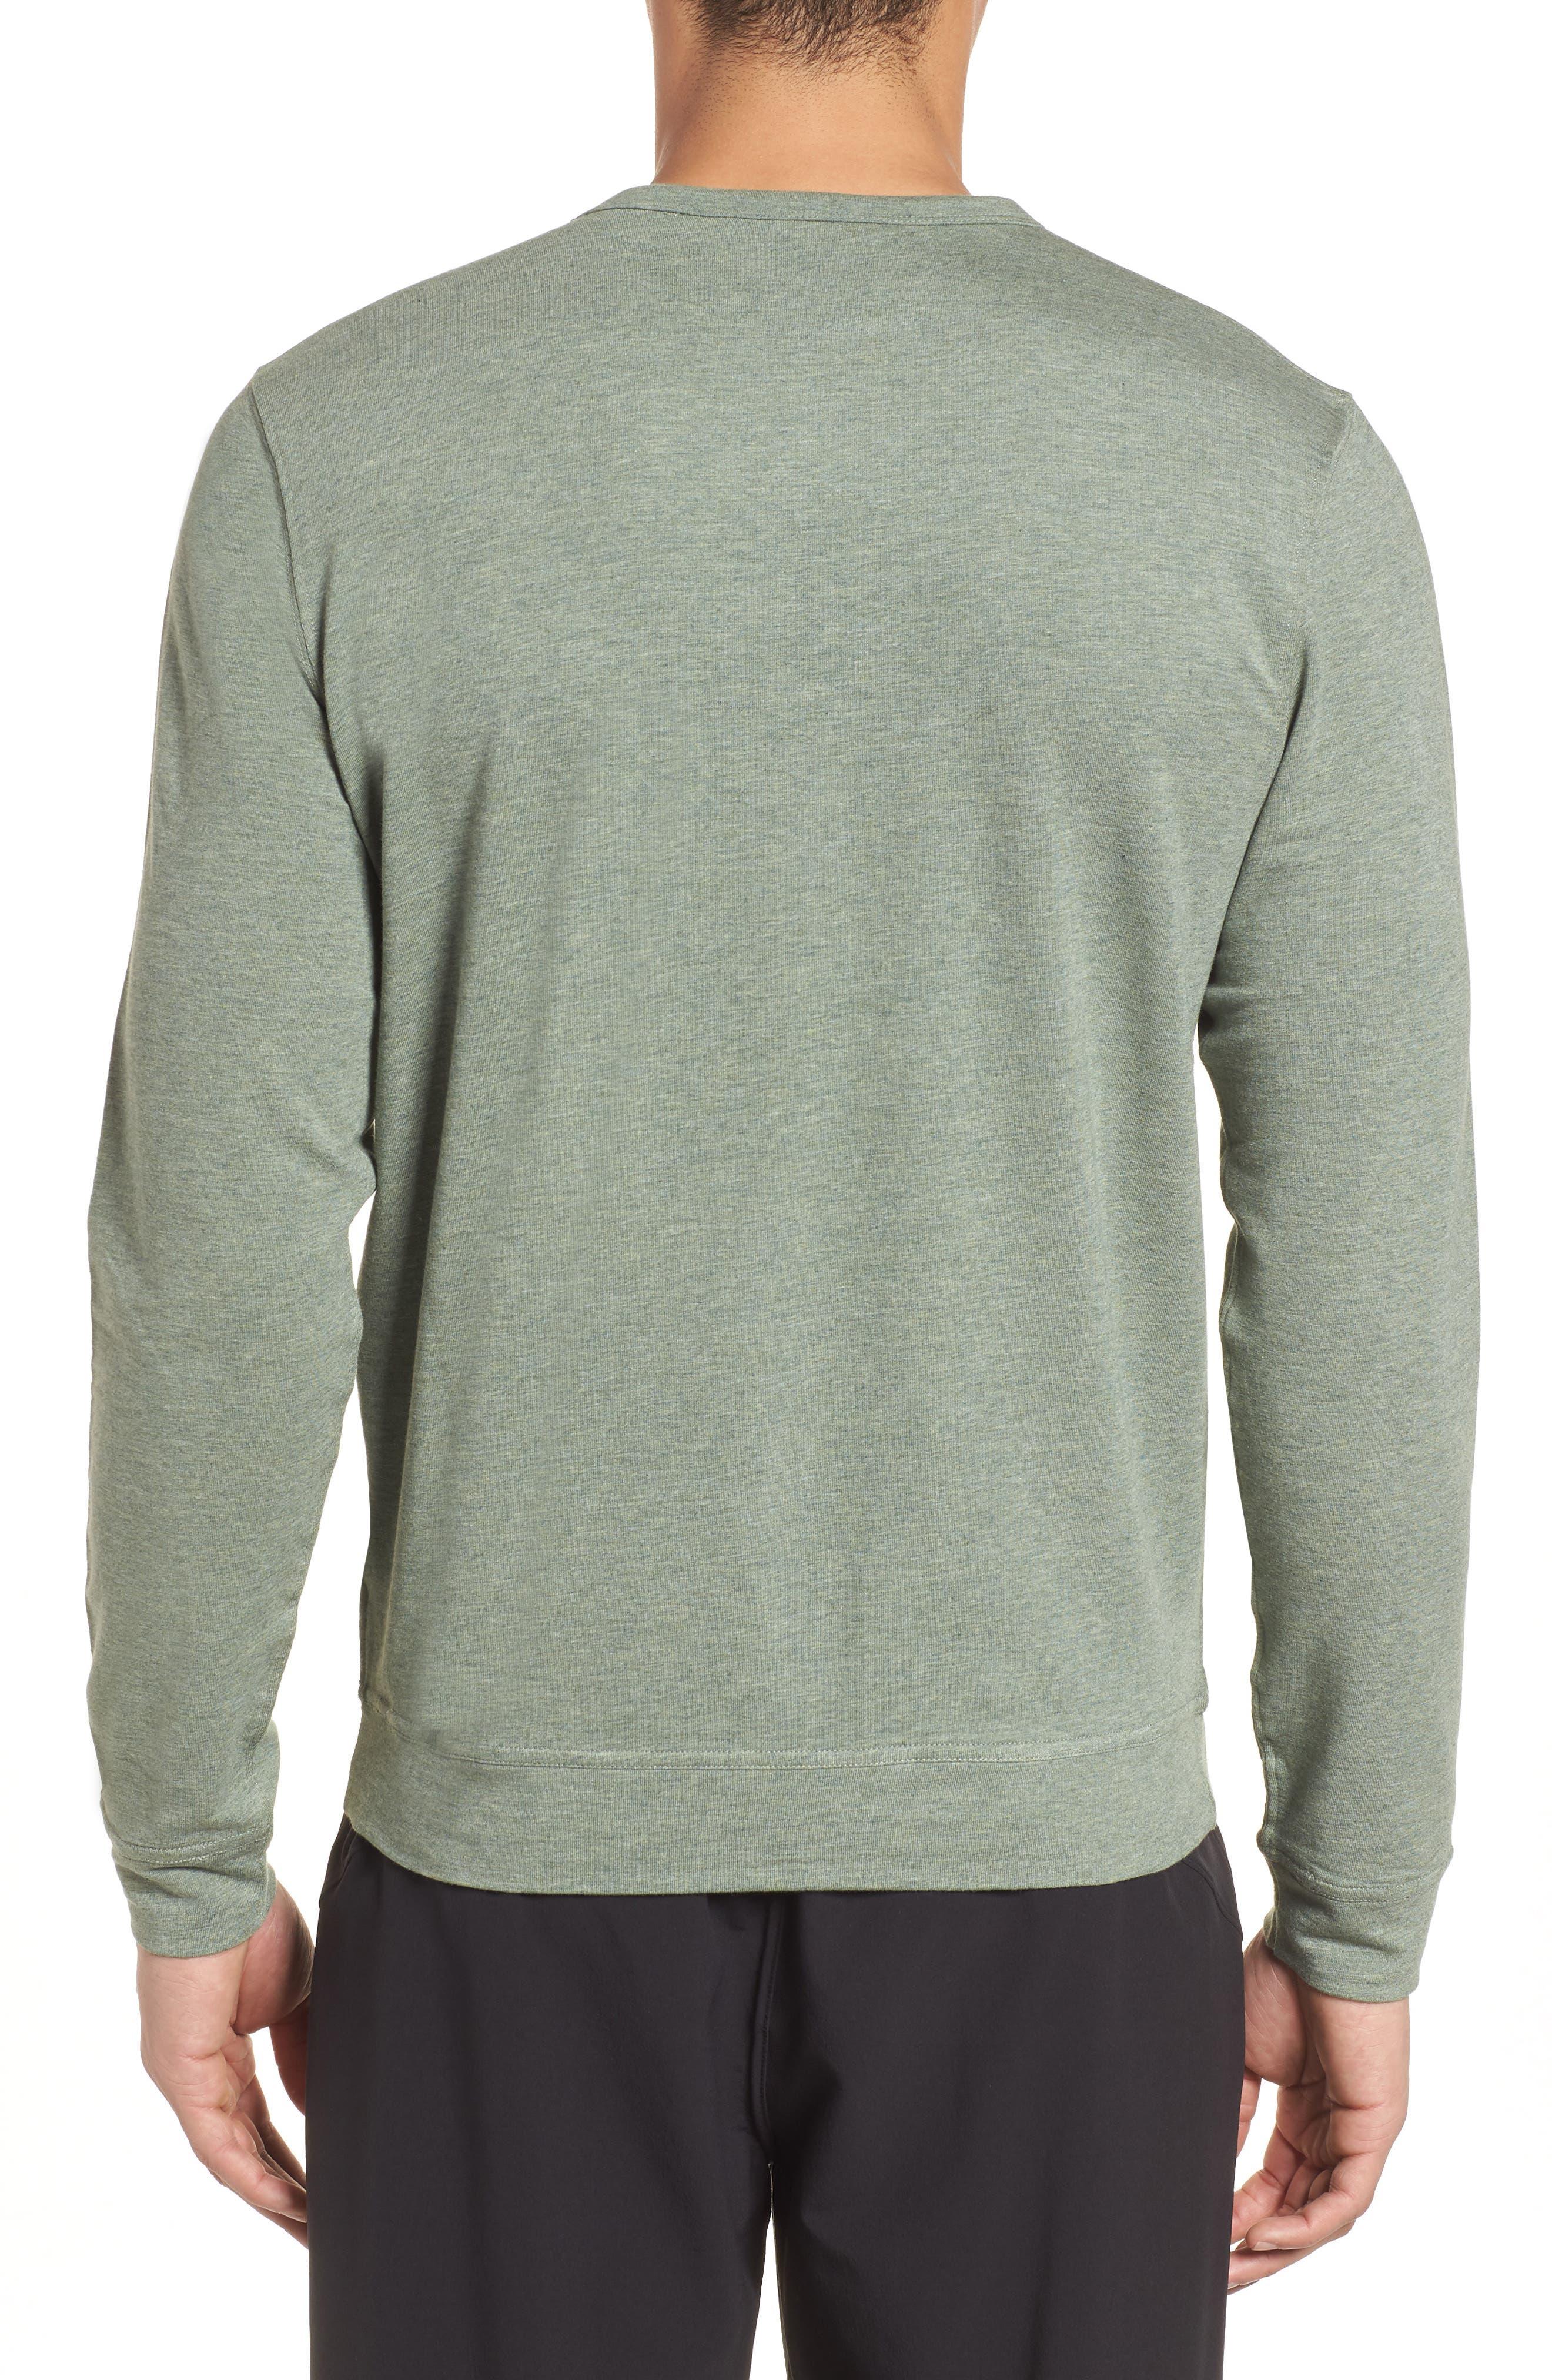 Legacy Crewneck Sweatshirt,                             Alternate thumbnail 2, color,                             Kelp Heather